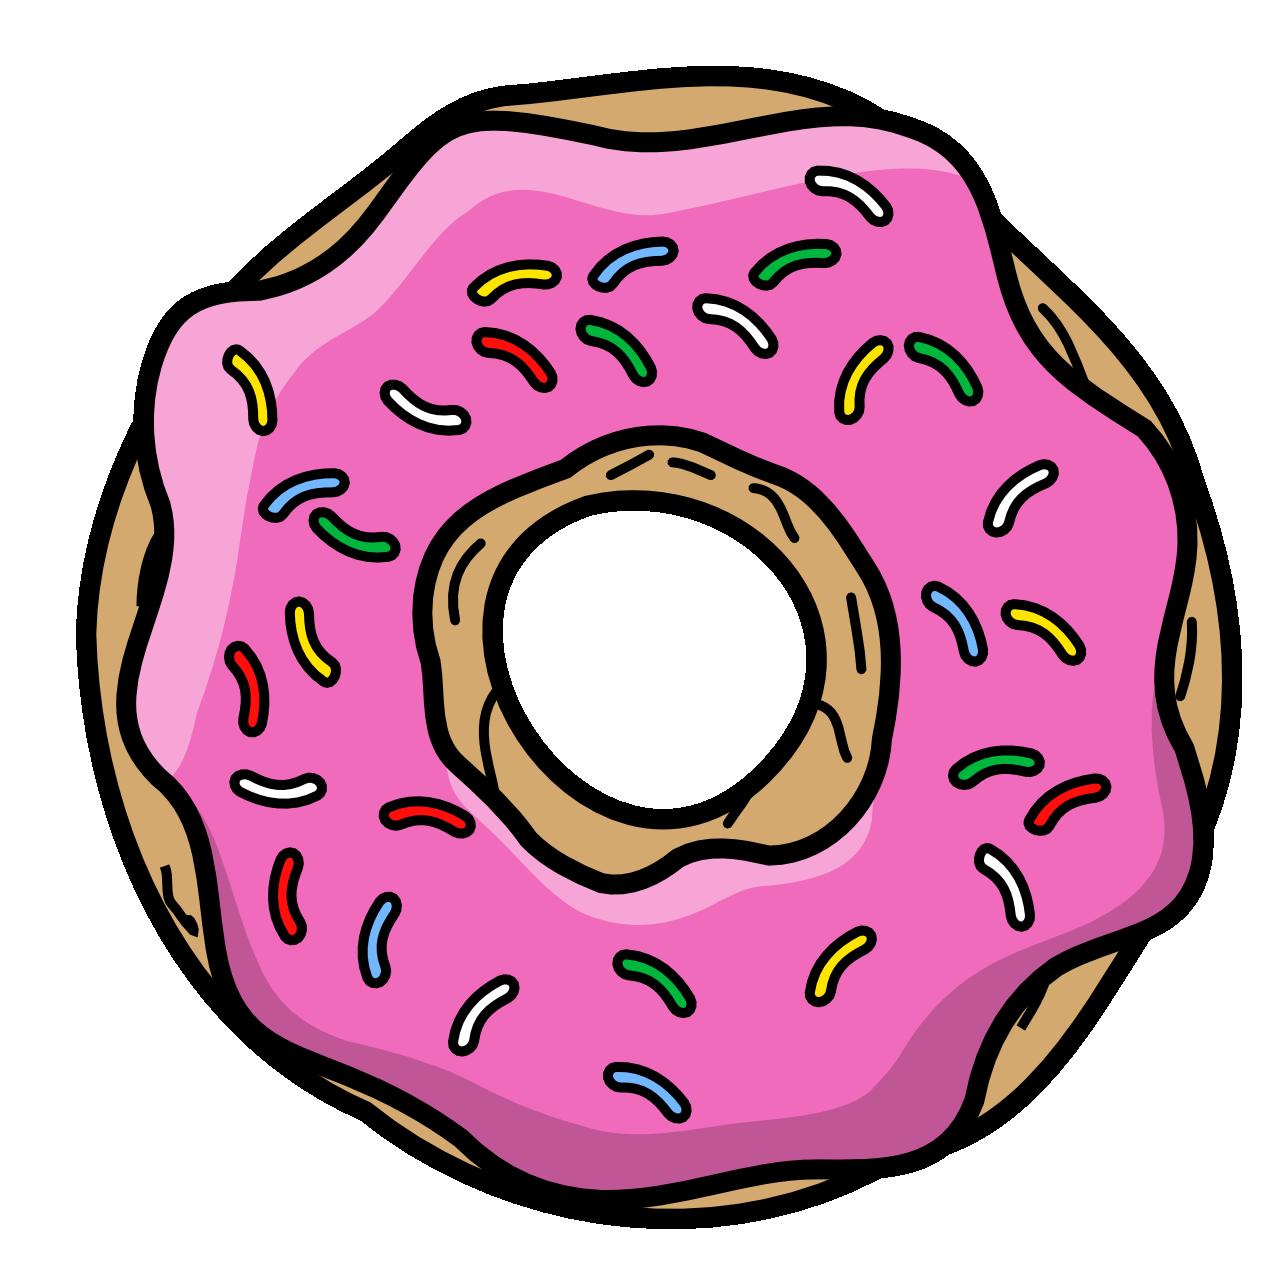 Donut Cartoon by TheGoldenBox on DeviantArt